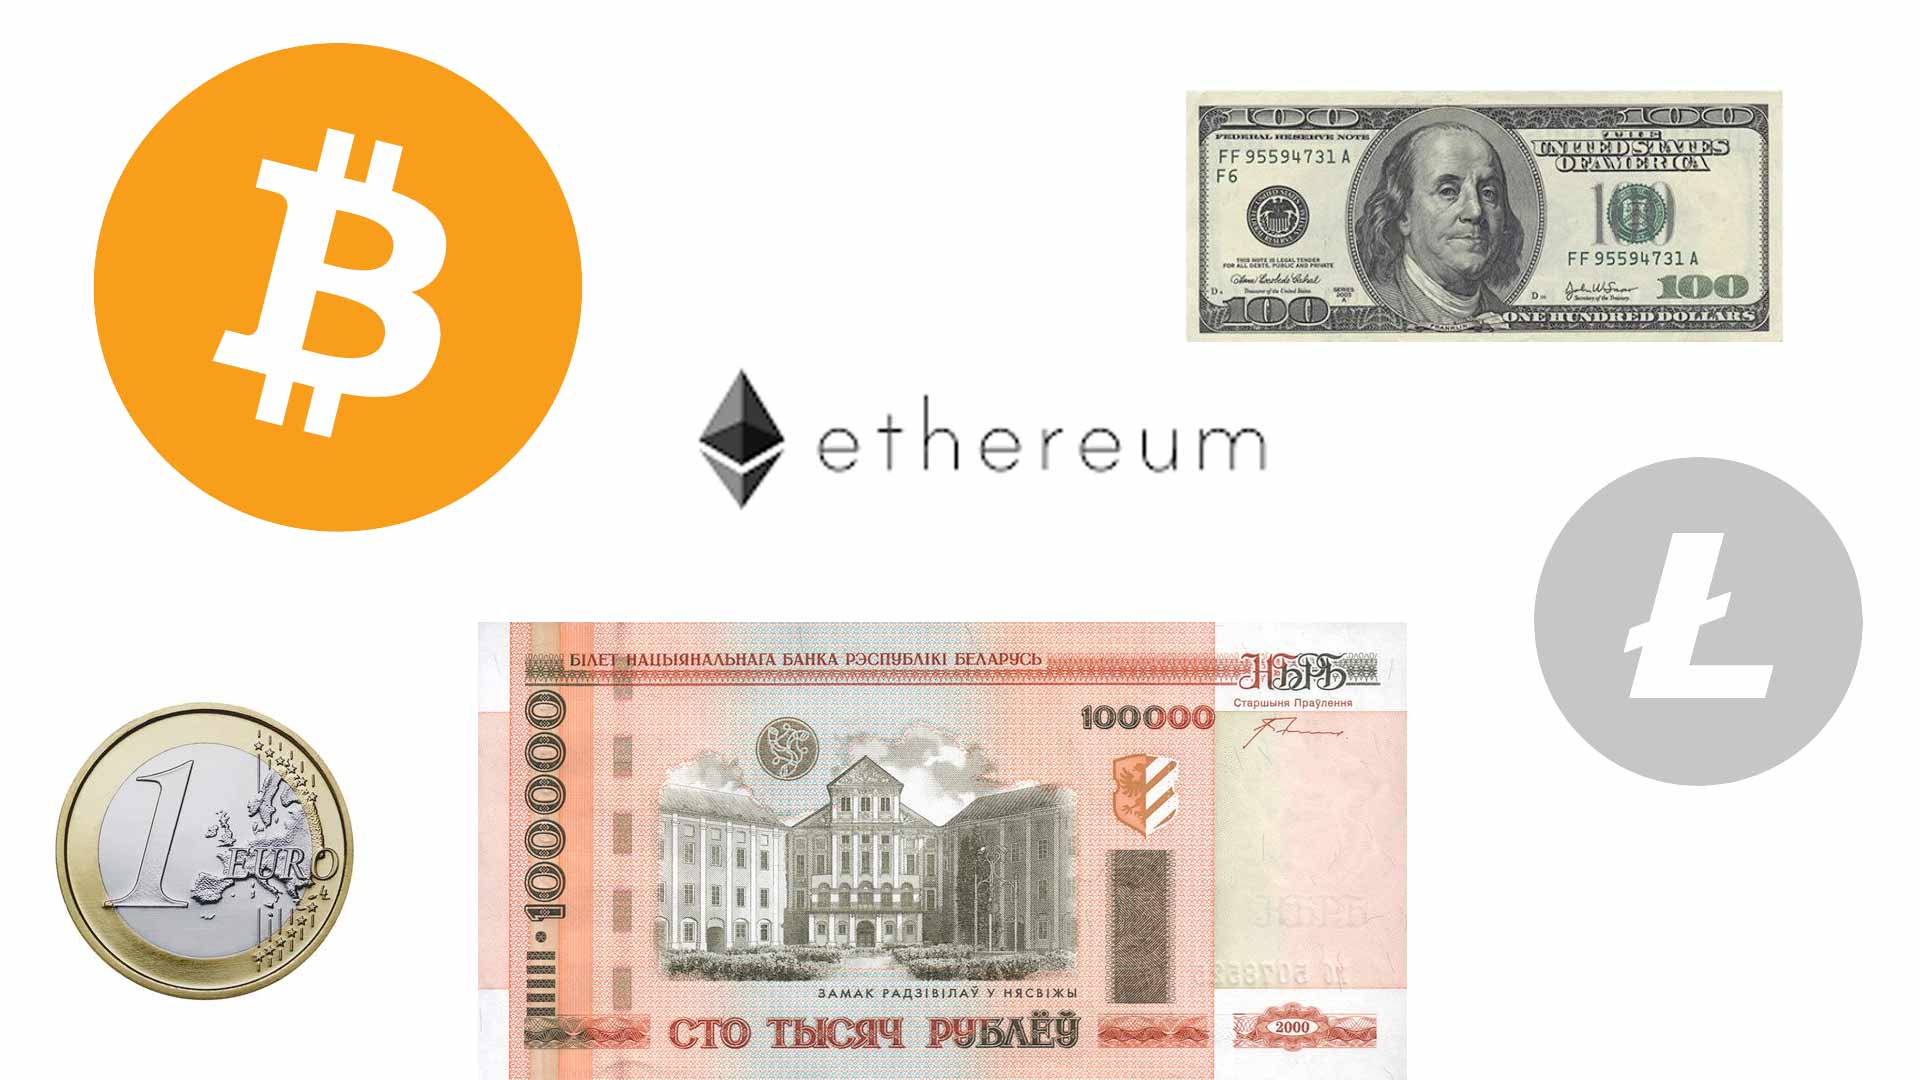 bitcoin-litecoin-ethereum-USd, best bitcoin buy sell, best bitcoin exchanges, best ethereum exchanges